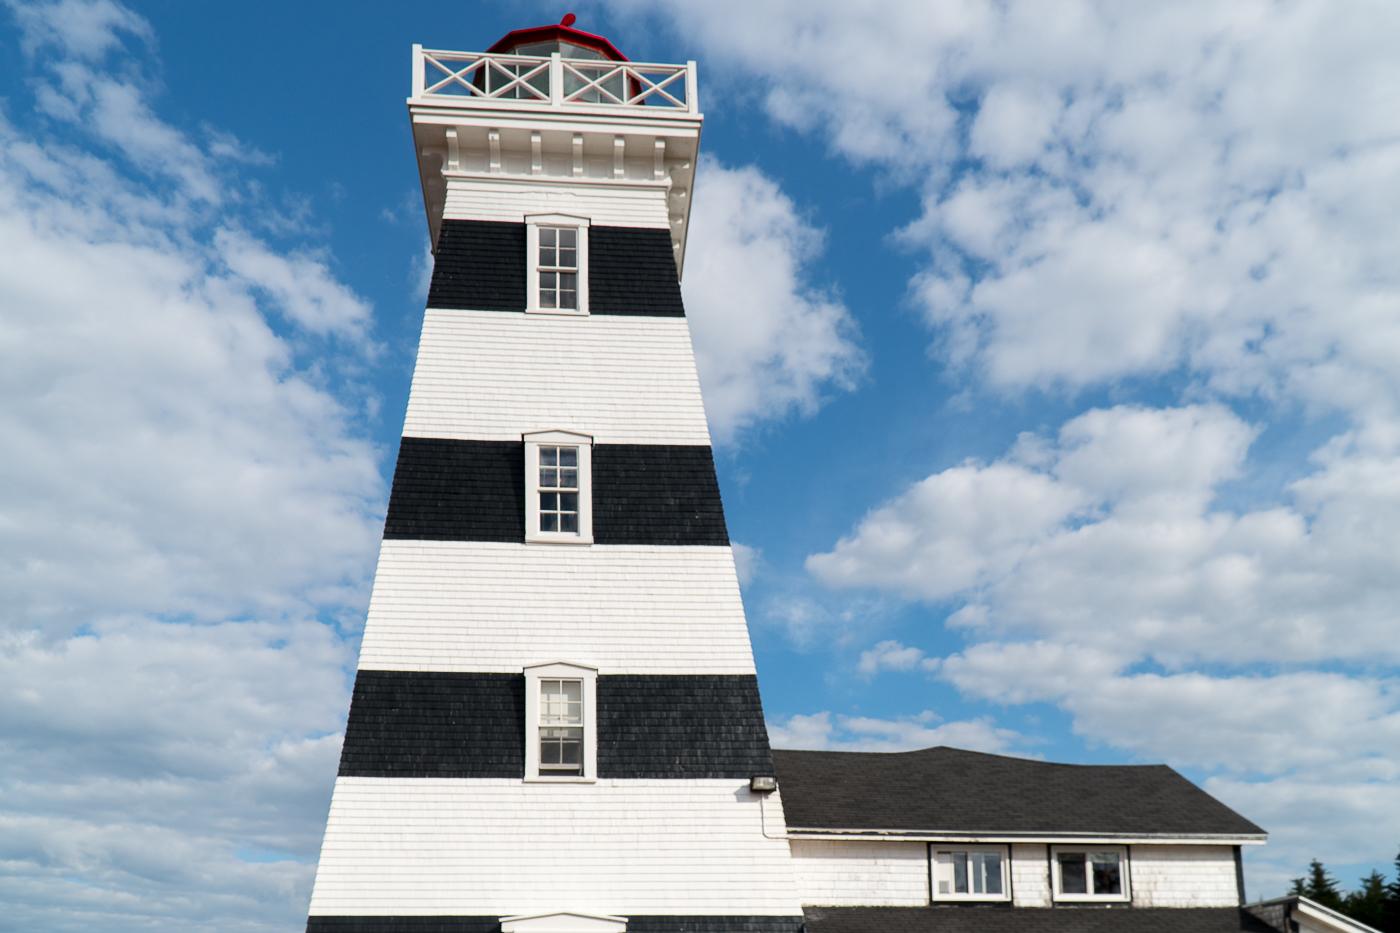 West Point Lighthouse Museum and Inn où dormir à l'Île-du-Prince-Édouard